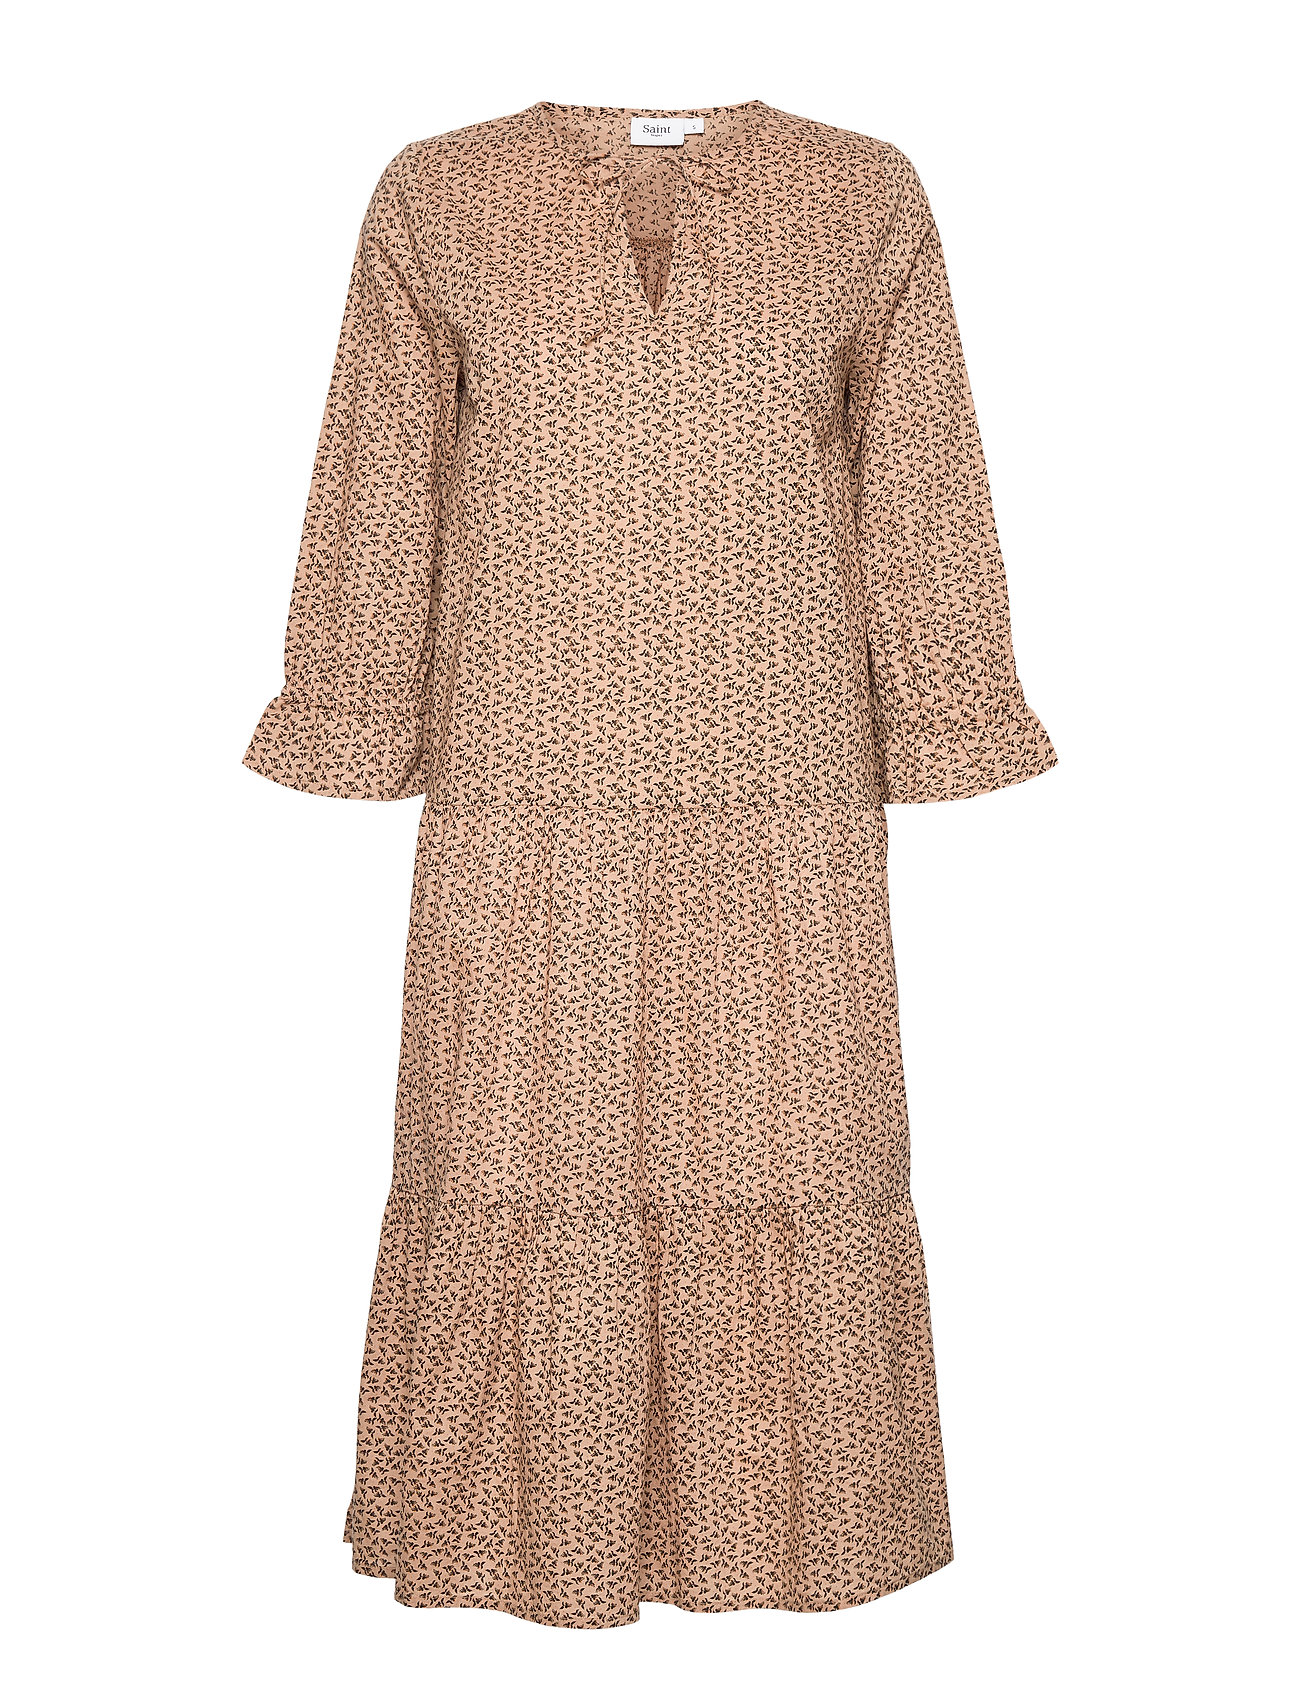 Image of Pennysz Dress Knælang Kjole Beige Saint Tropez (3528692633)